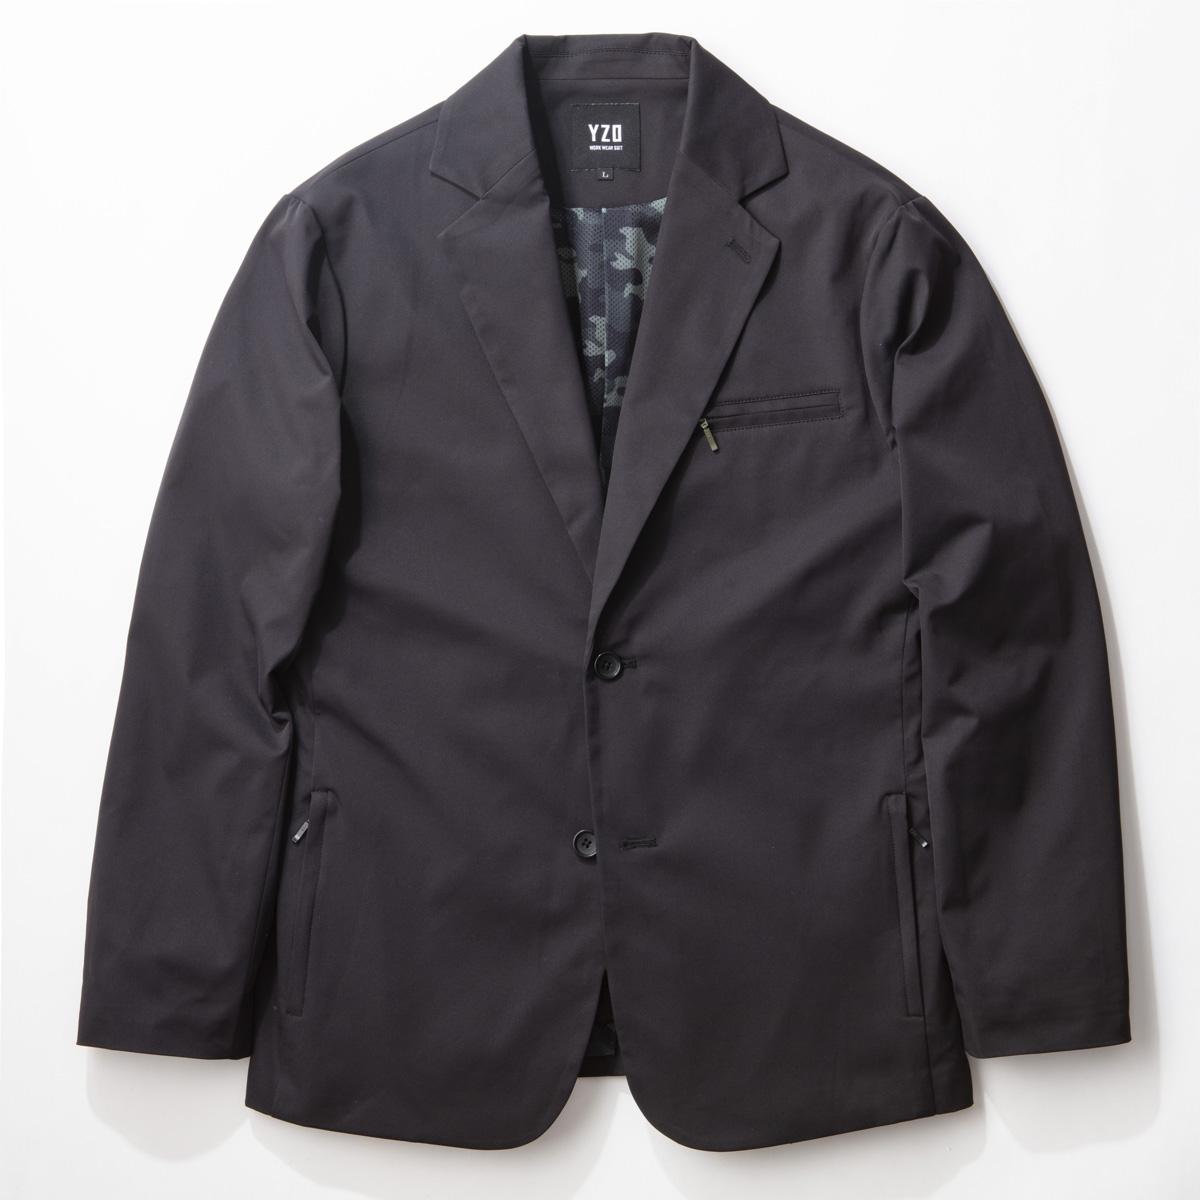 YZO カモフラージュテーラードジャケット